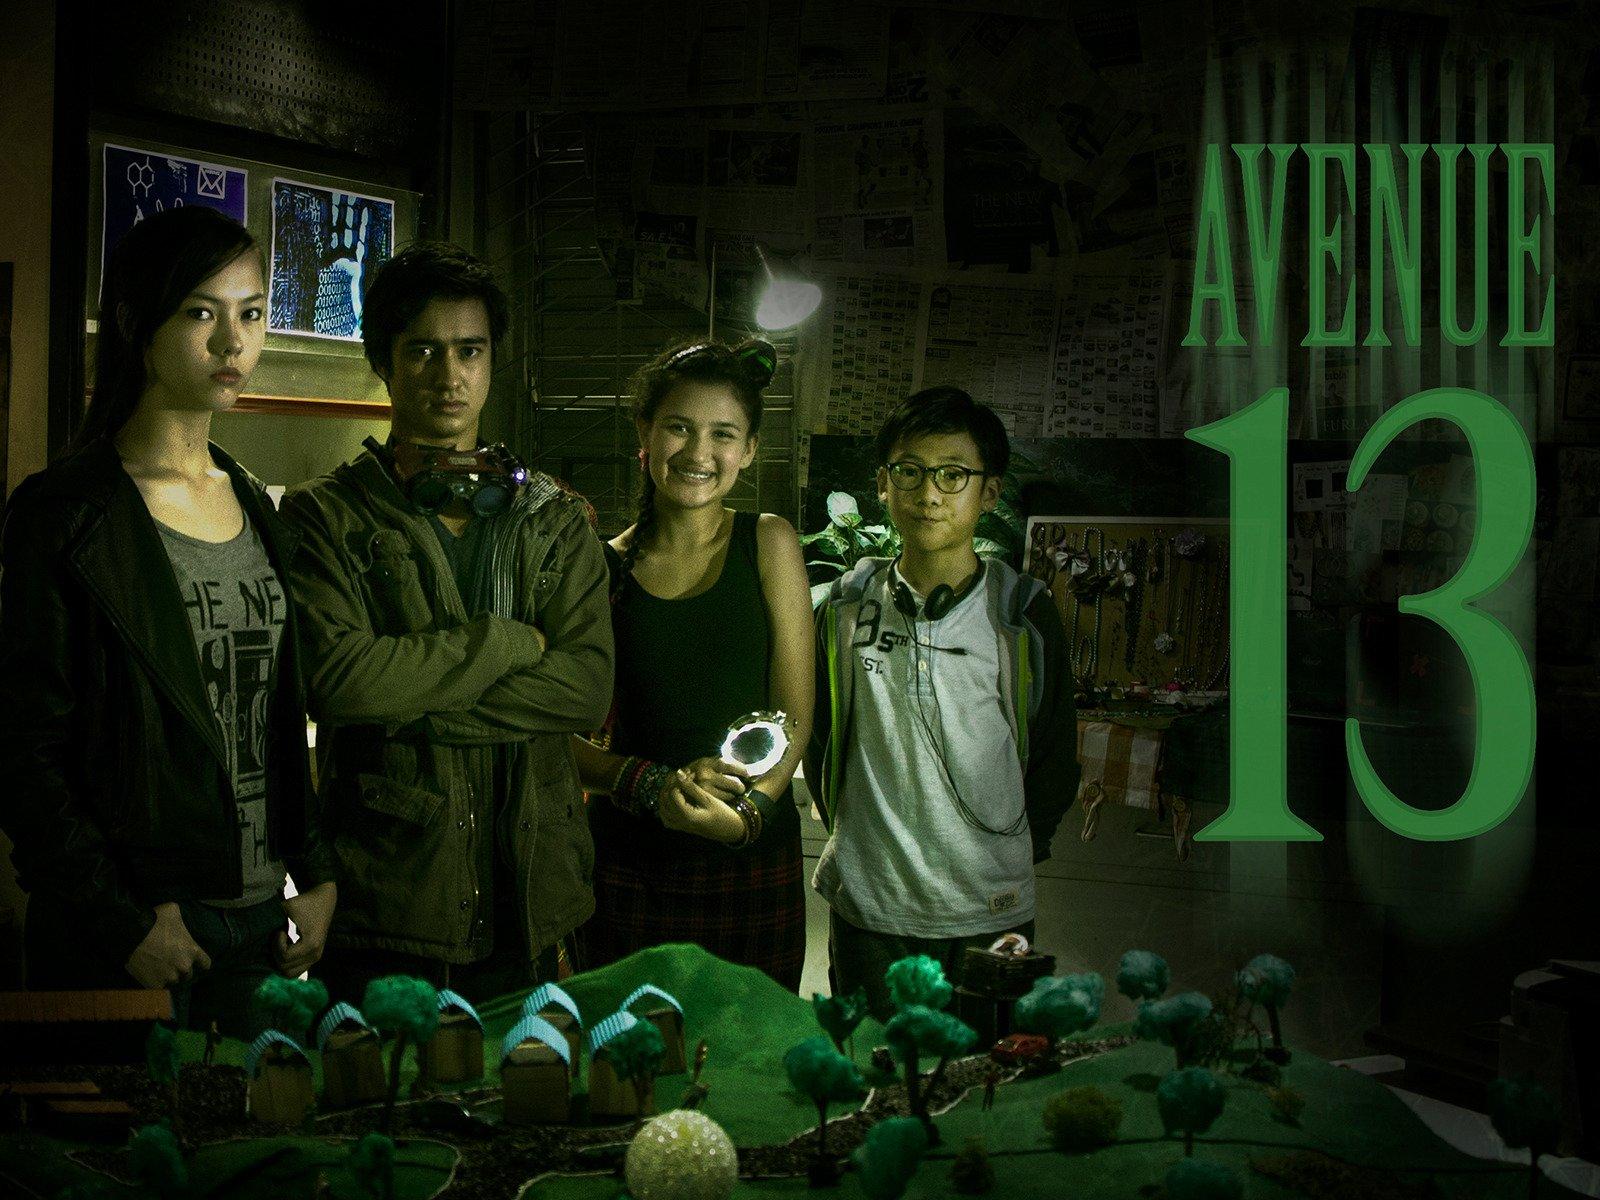 Avenue 13 - Season 1